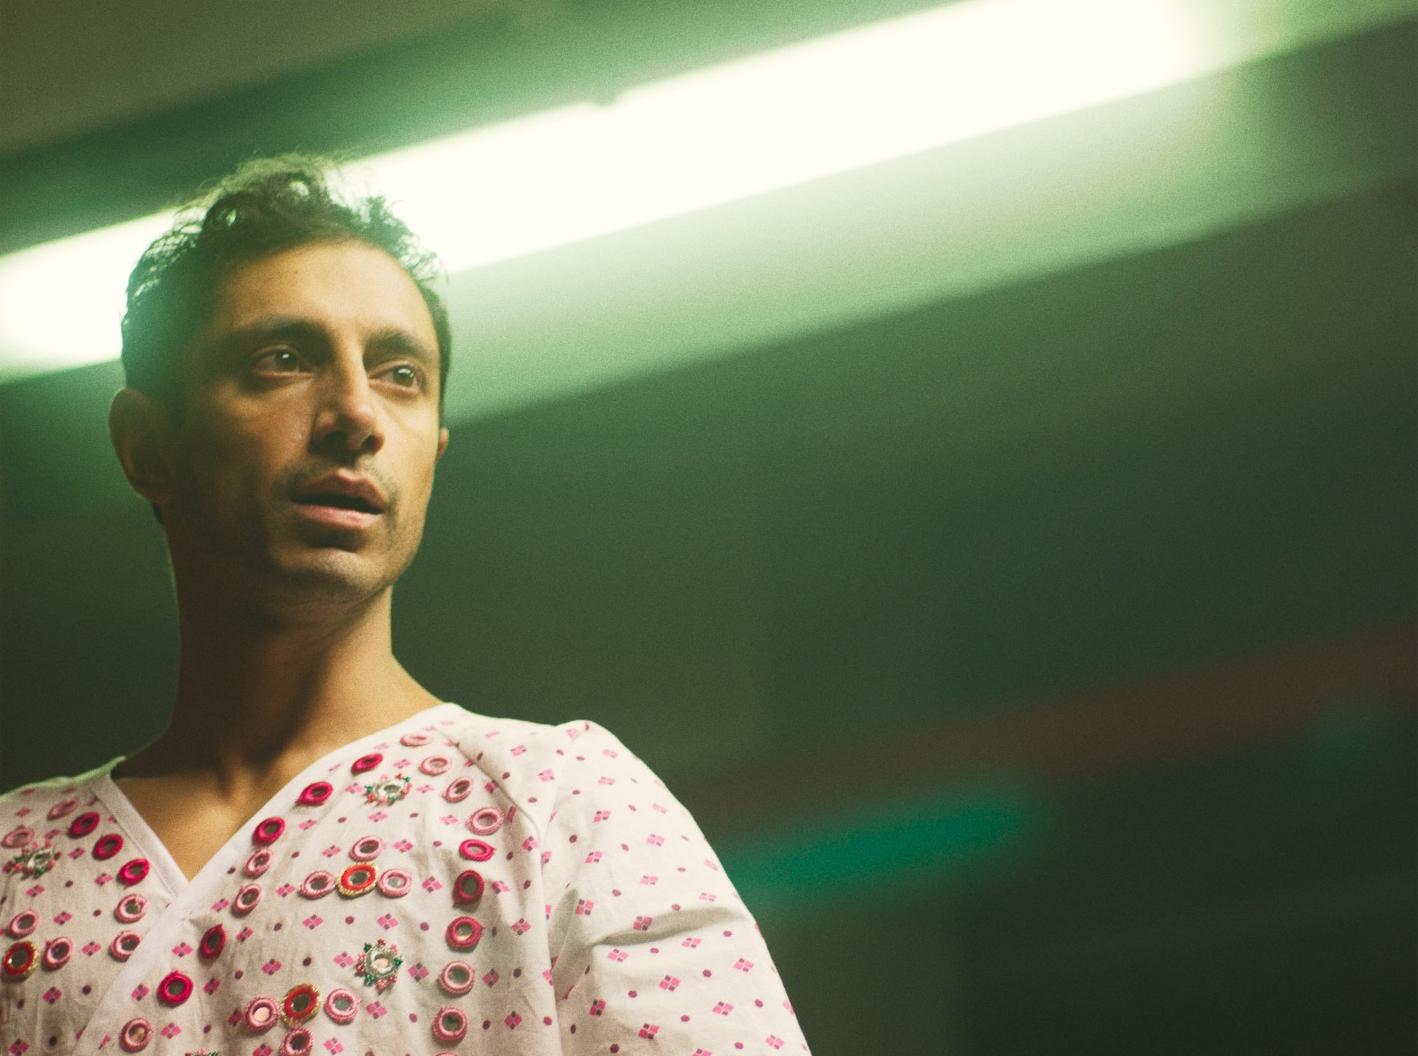 Mogul Mowgli: an electrifying film about generational trauma